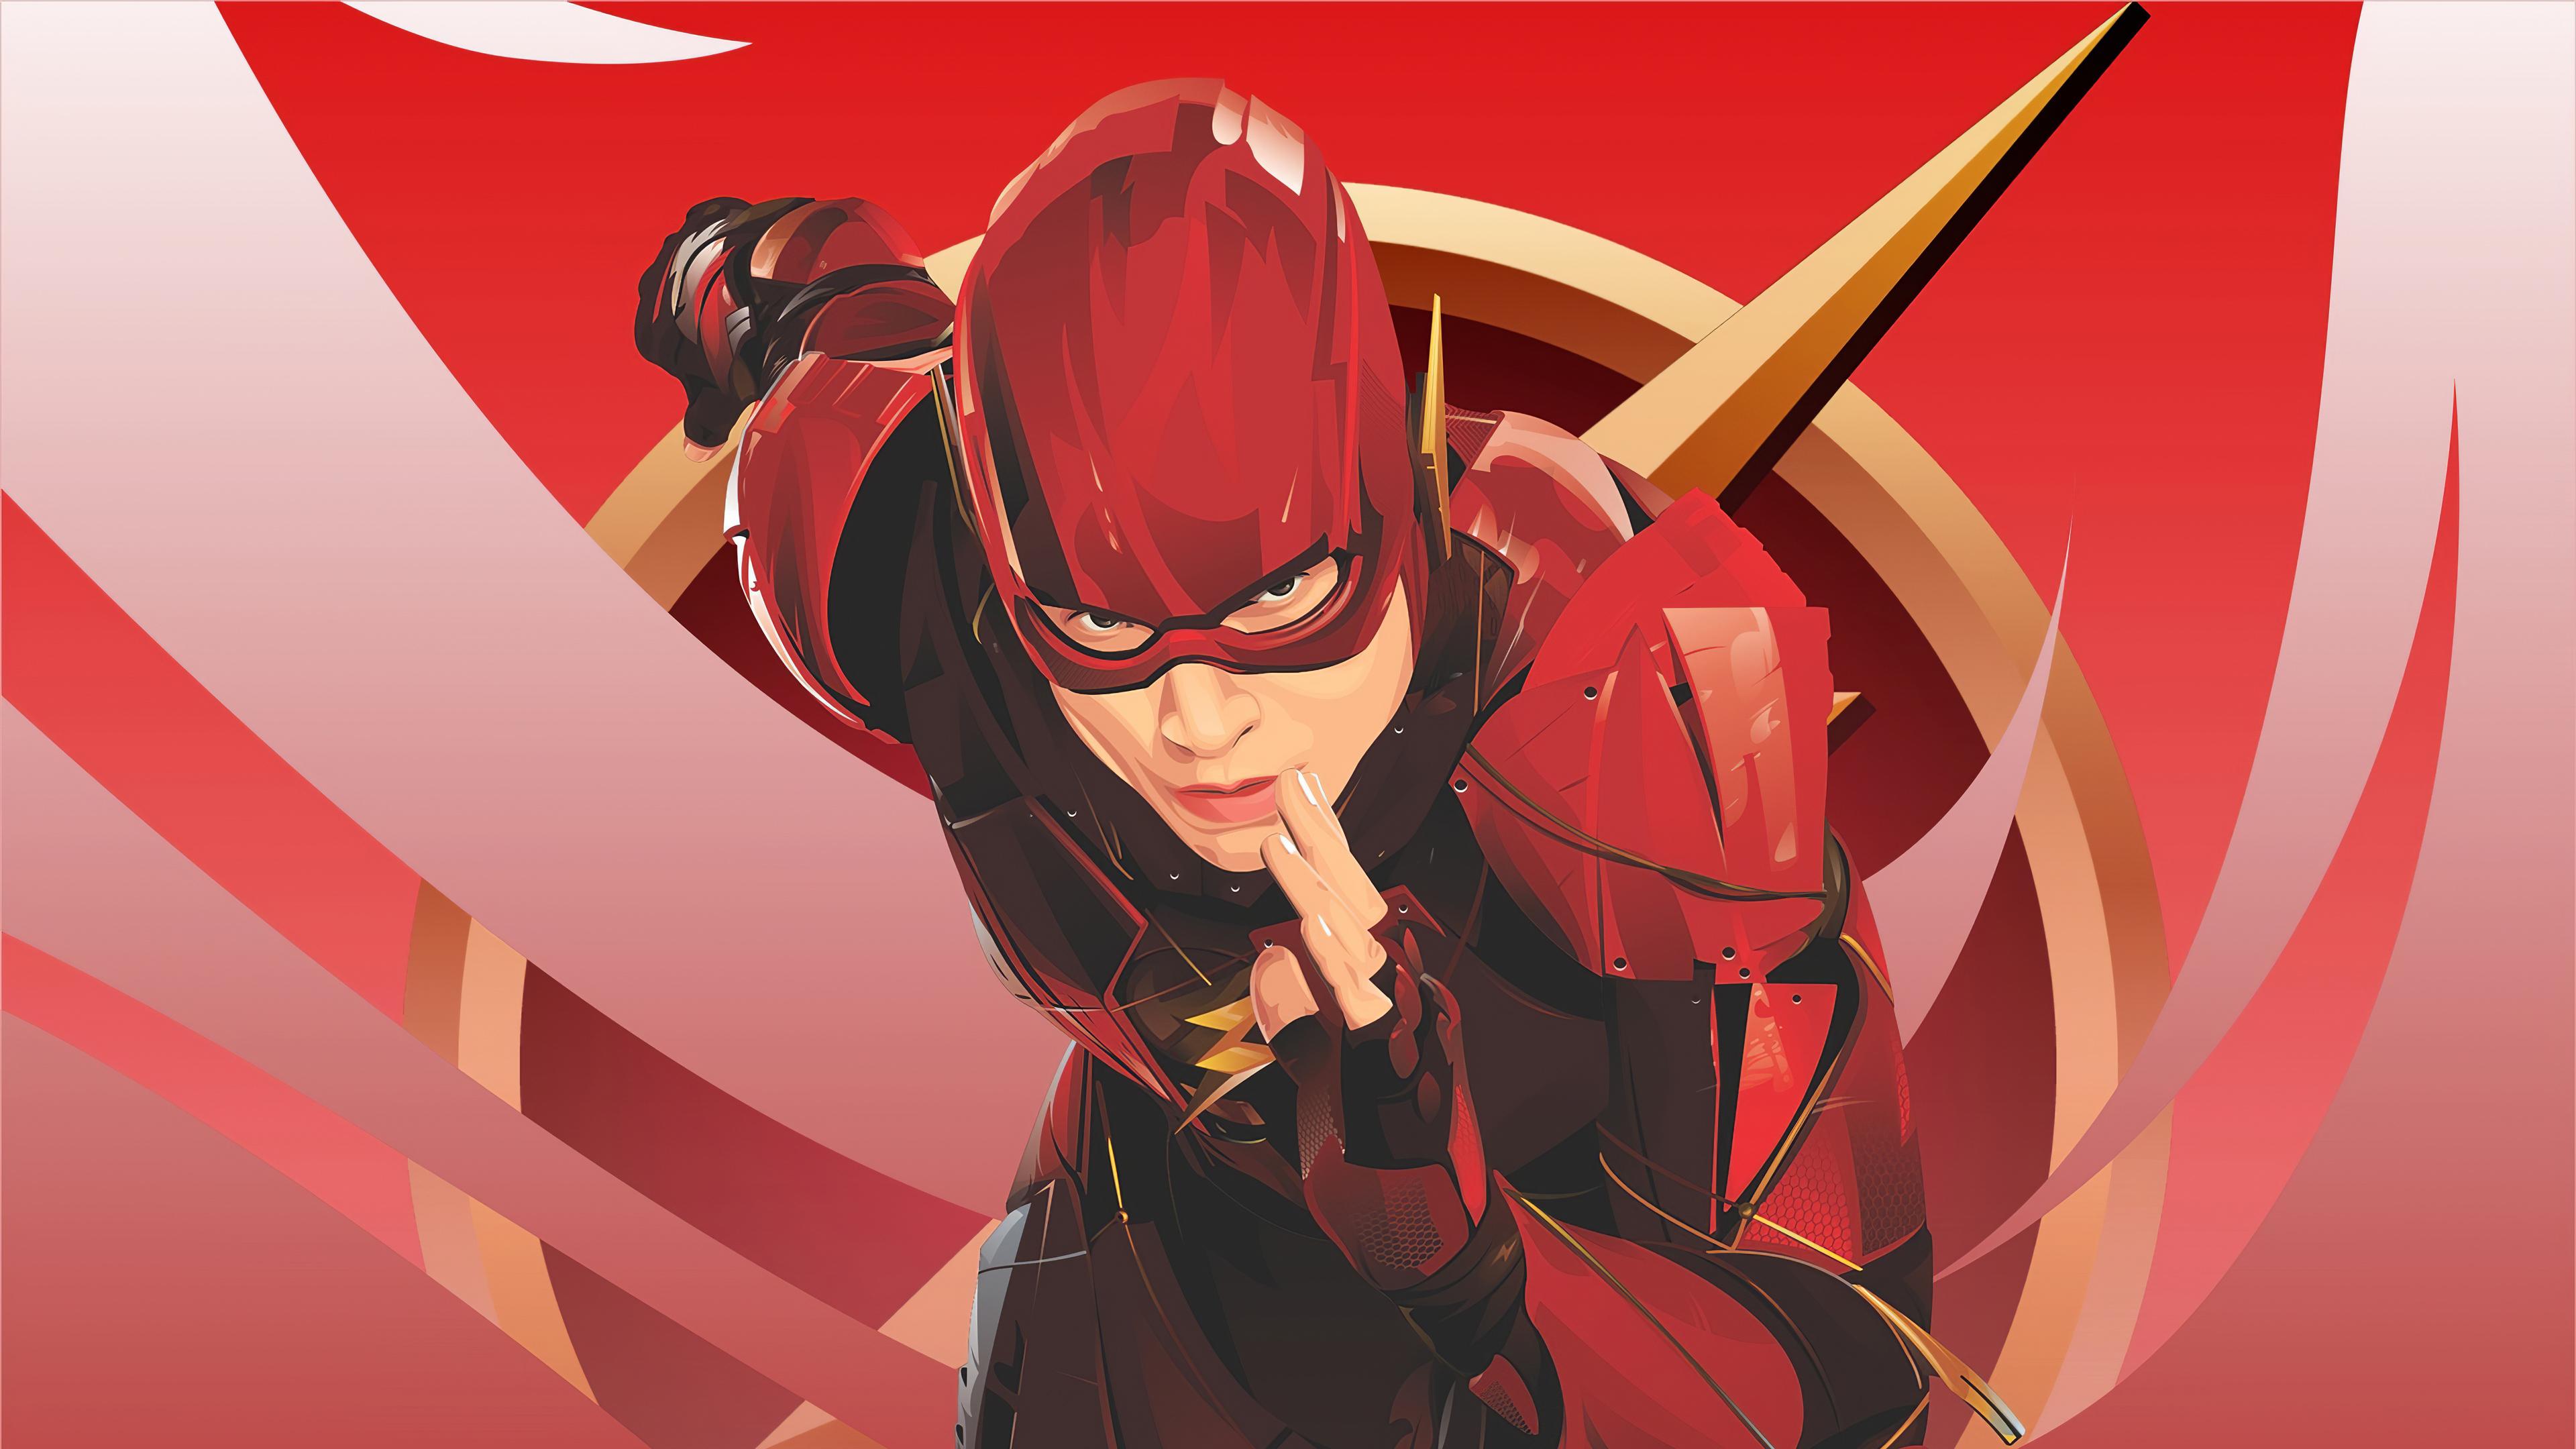 flash 1581355935 - Flash - flash wallpapers, Flash superhero wallpapers ultra hd 4k, Flash 4k wallpapers